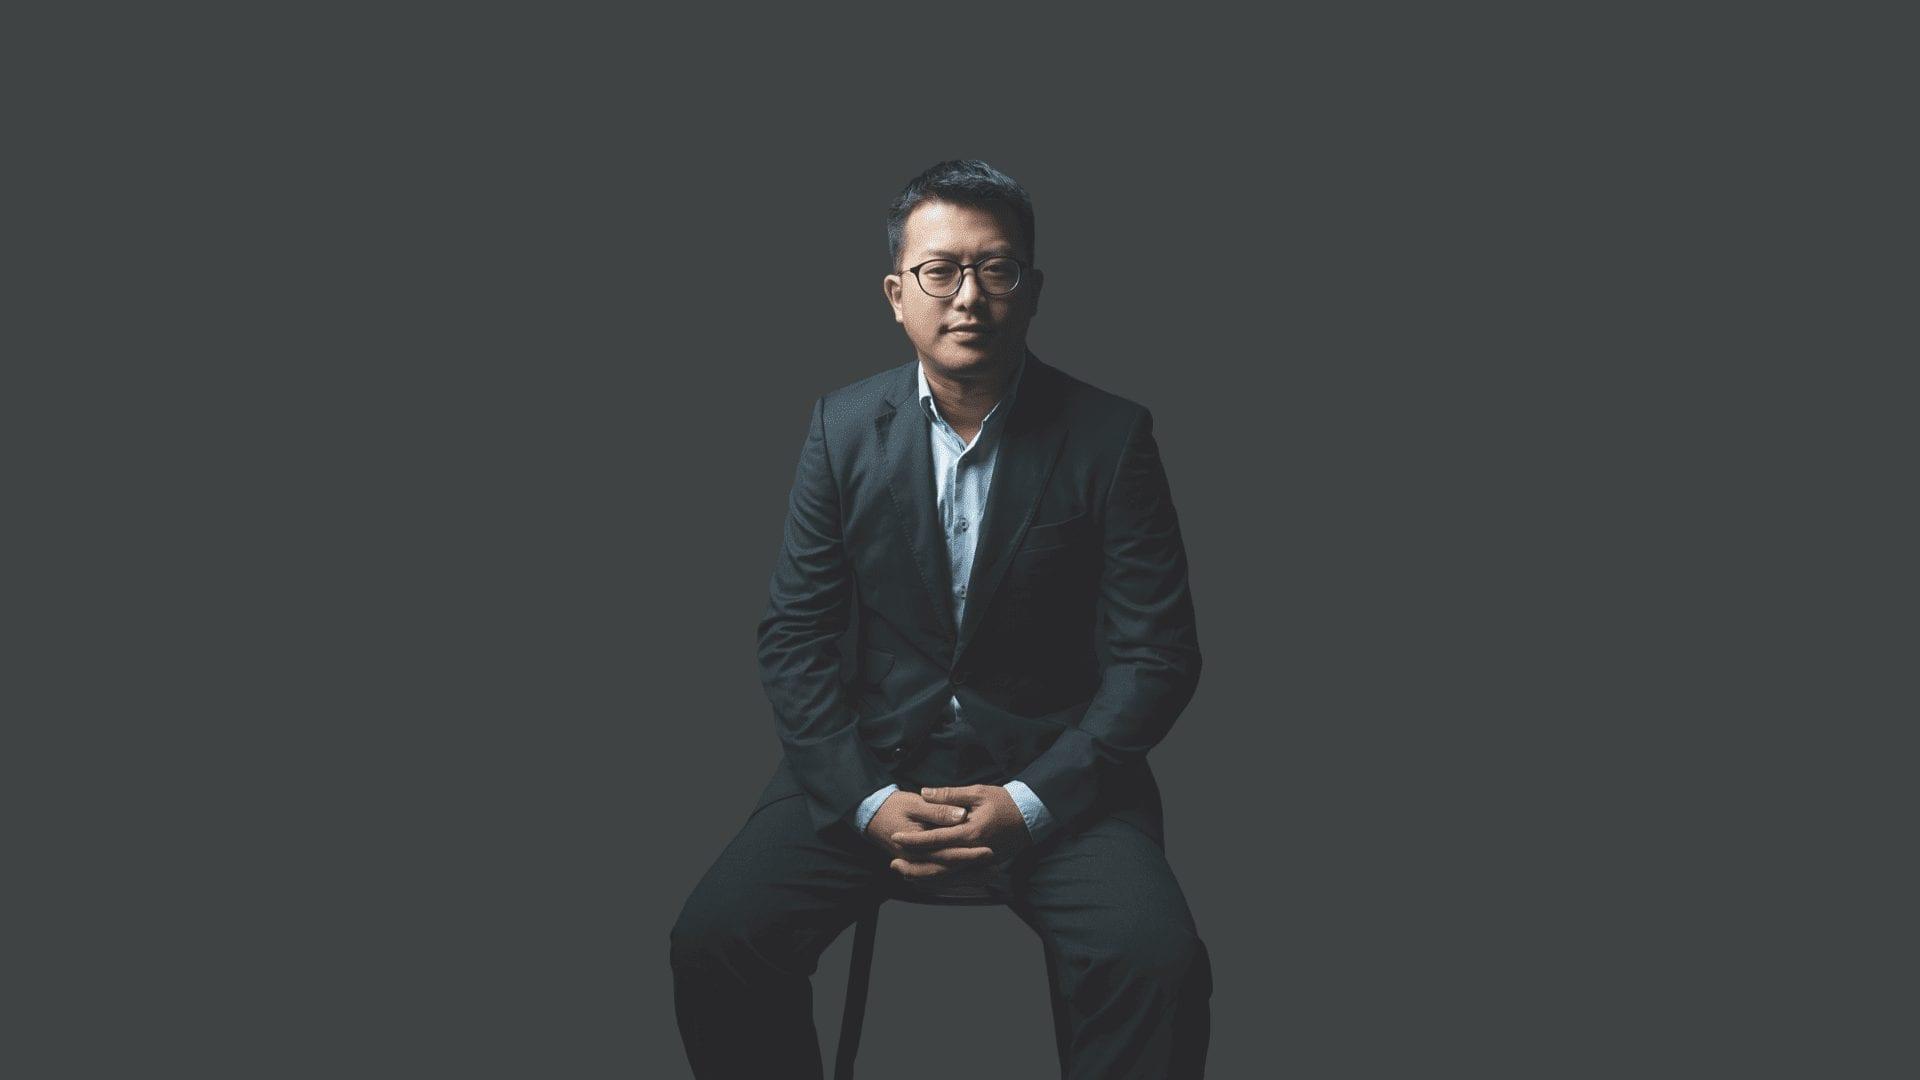 Louis Tan Leong Chuin